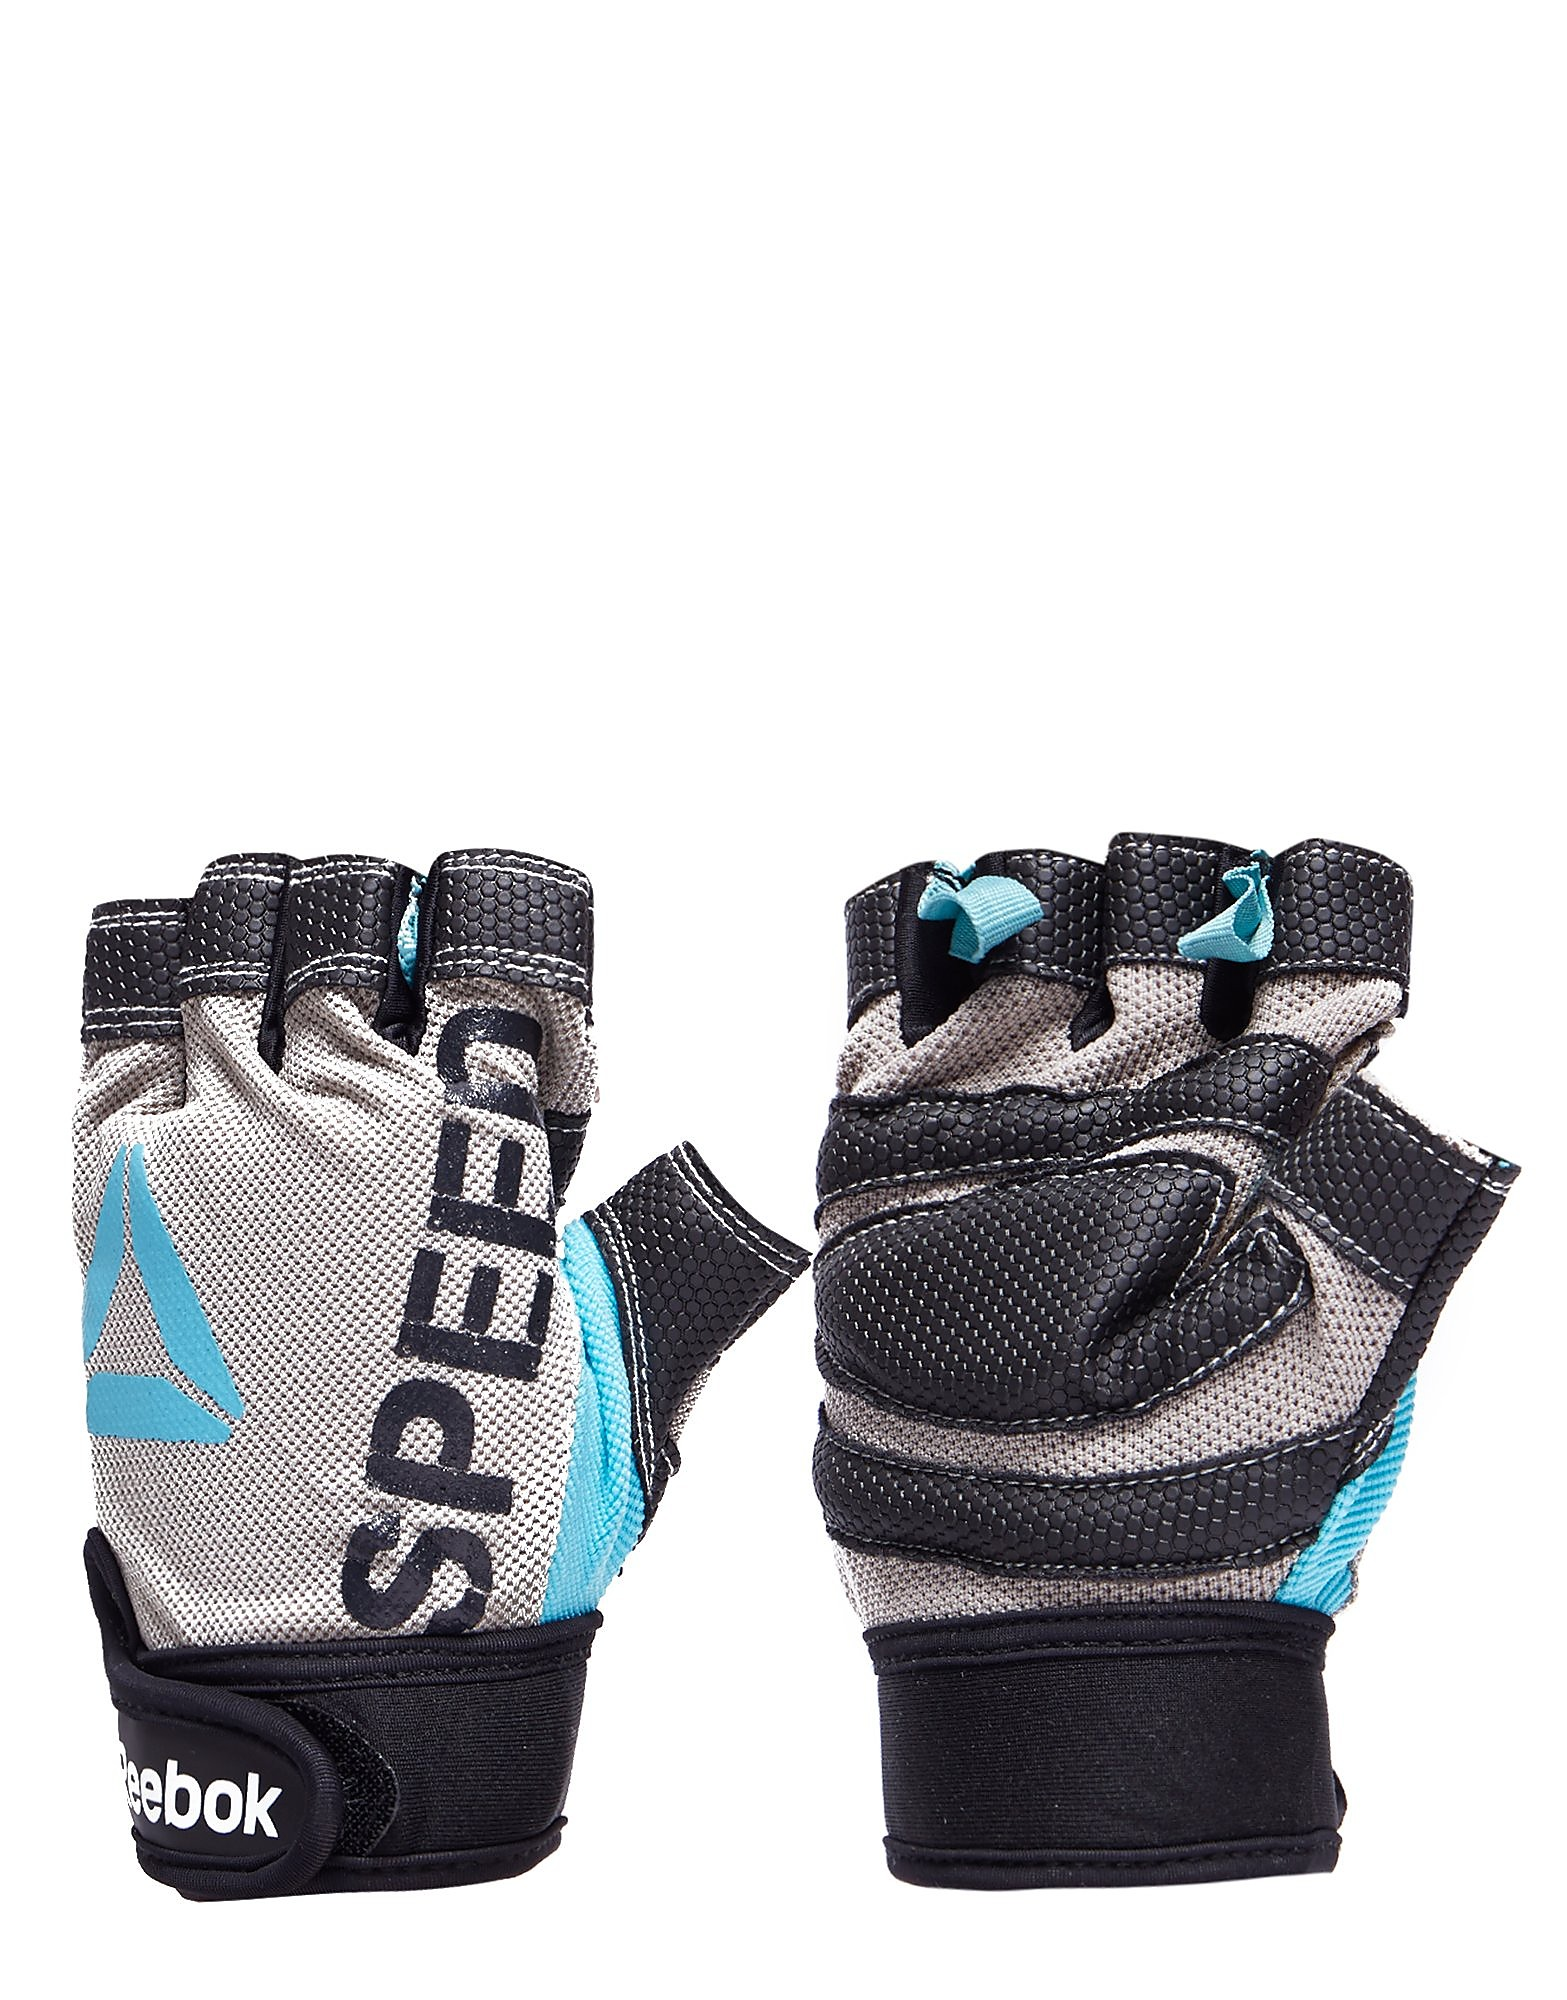 Reebok Training Speed Gloves